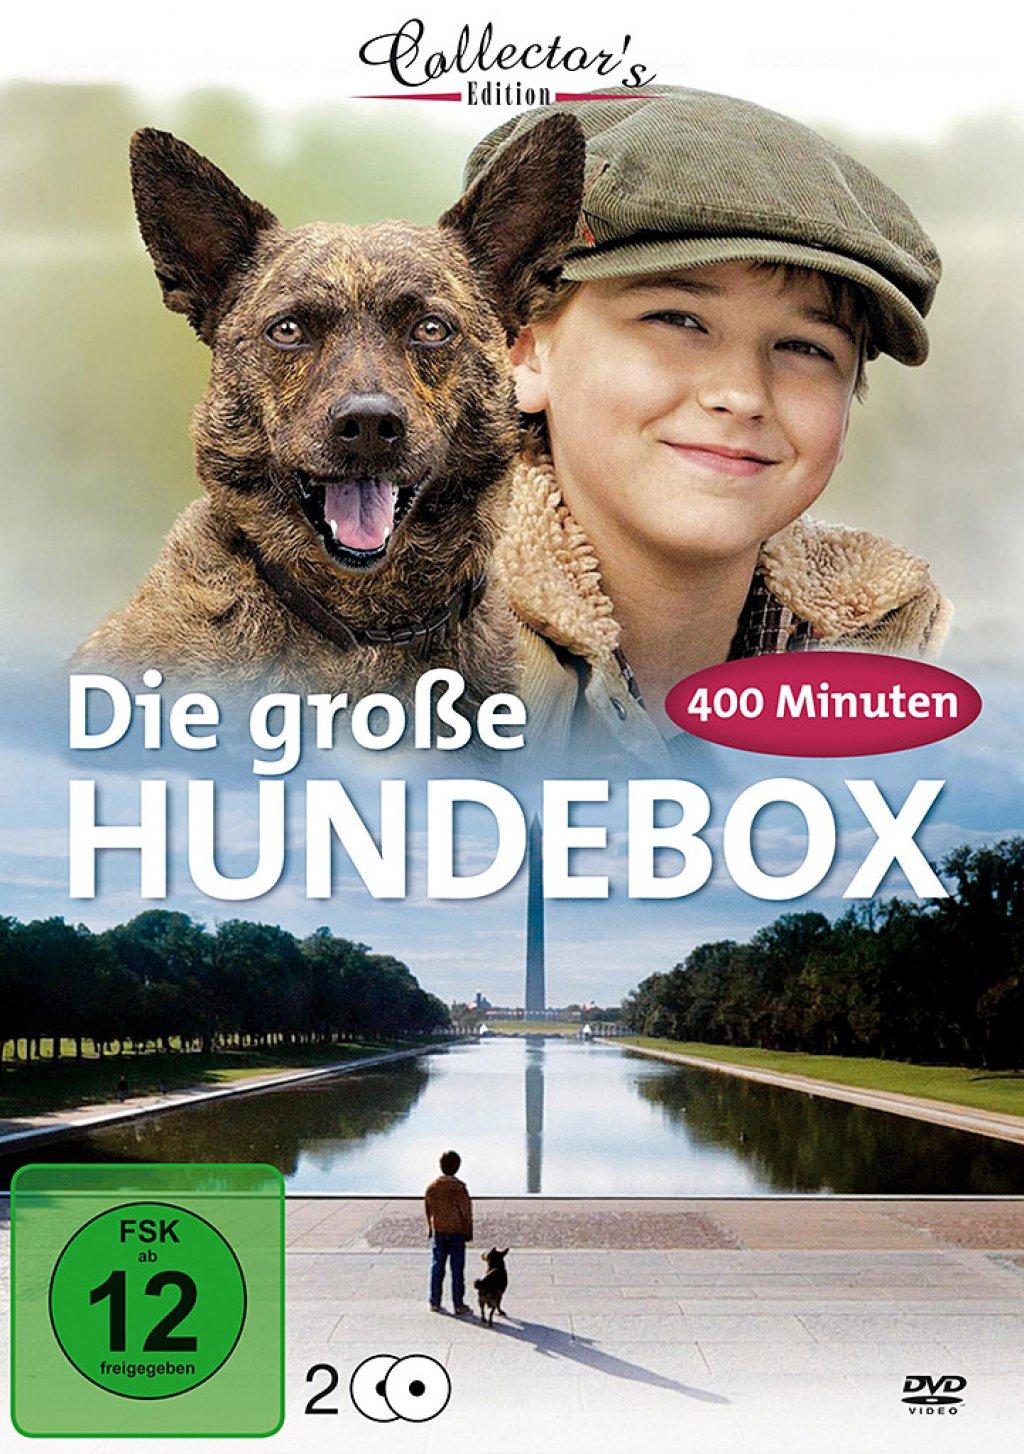 Die große Hundebox - Collector's Edition (DVD)